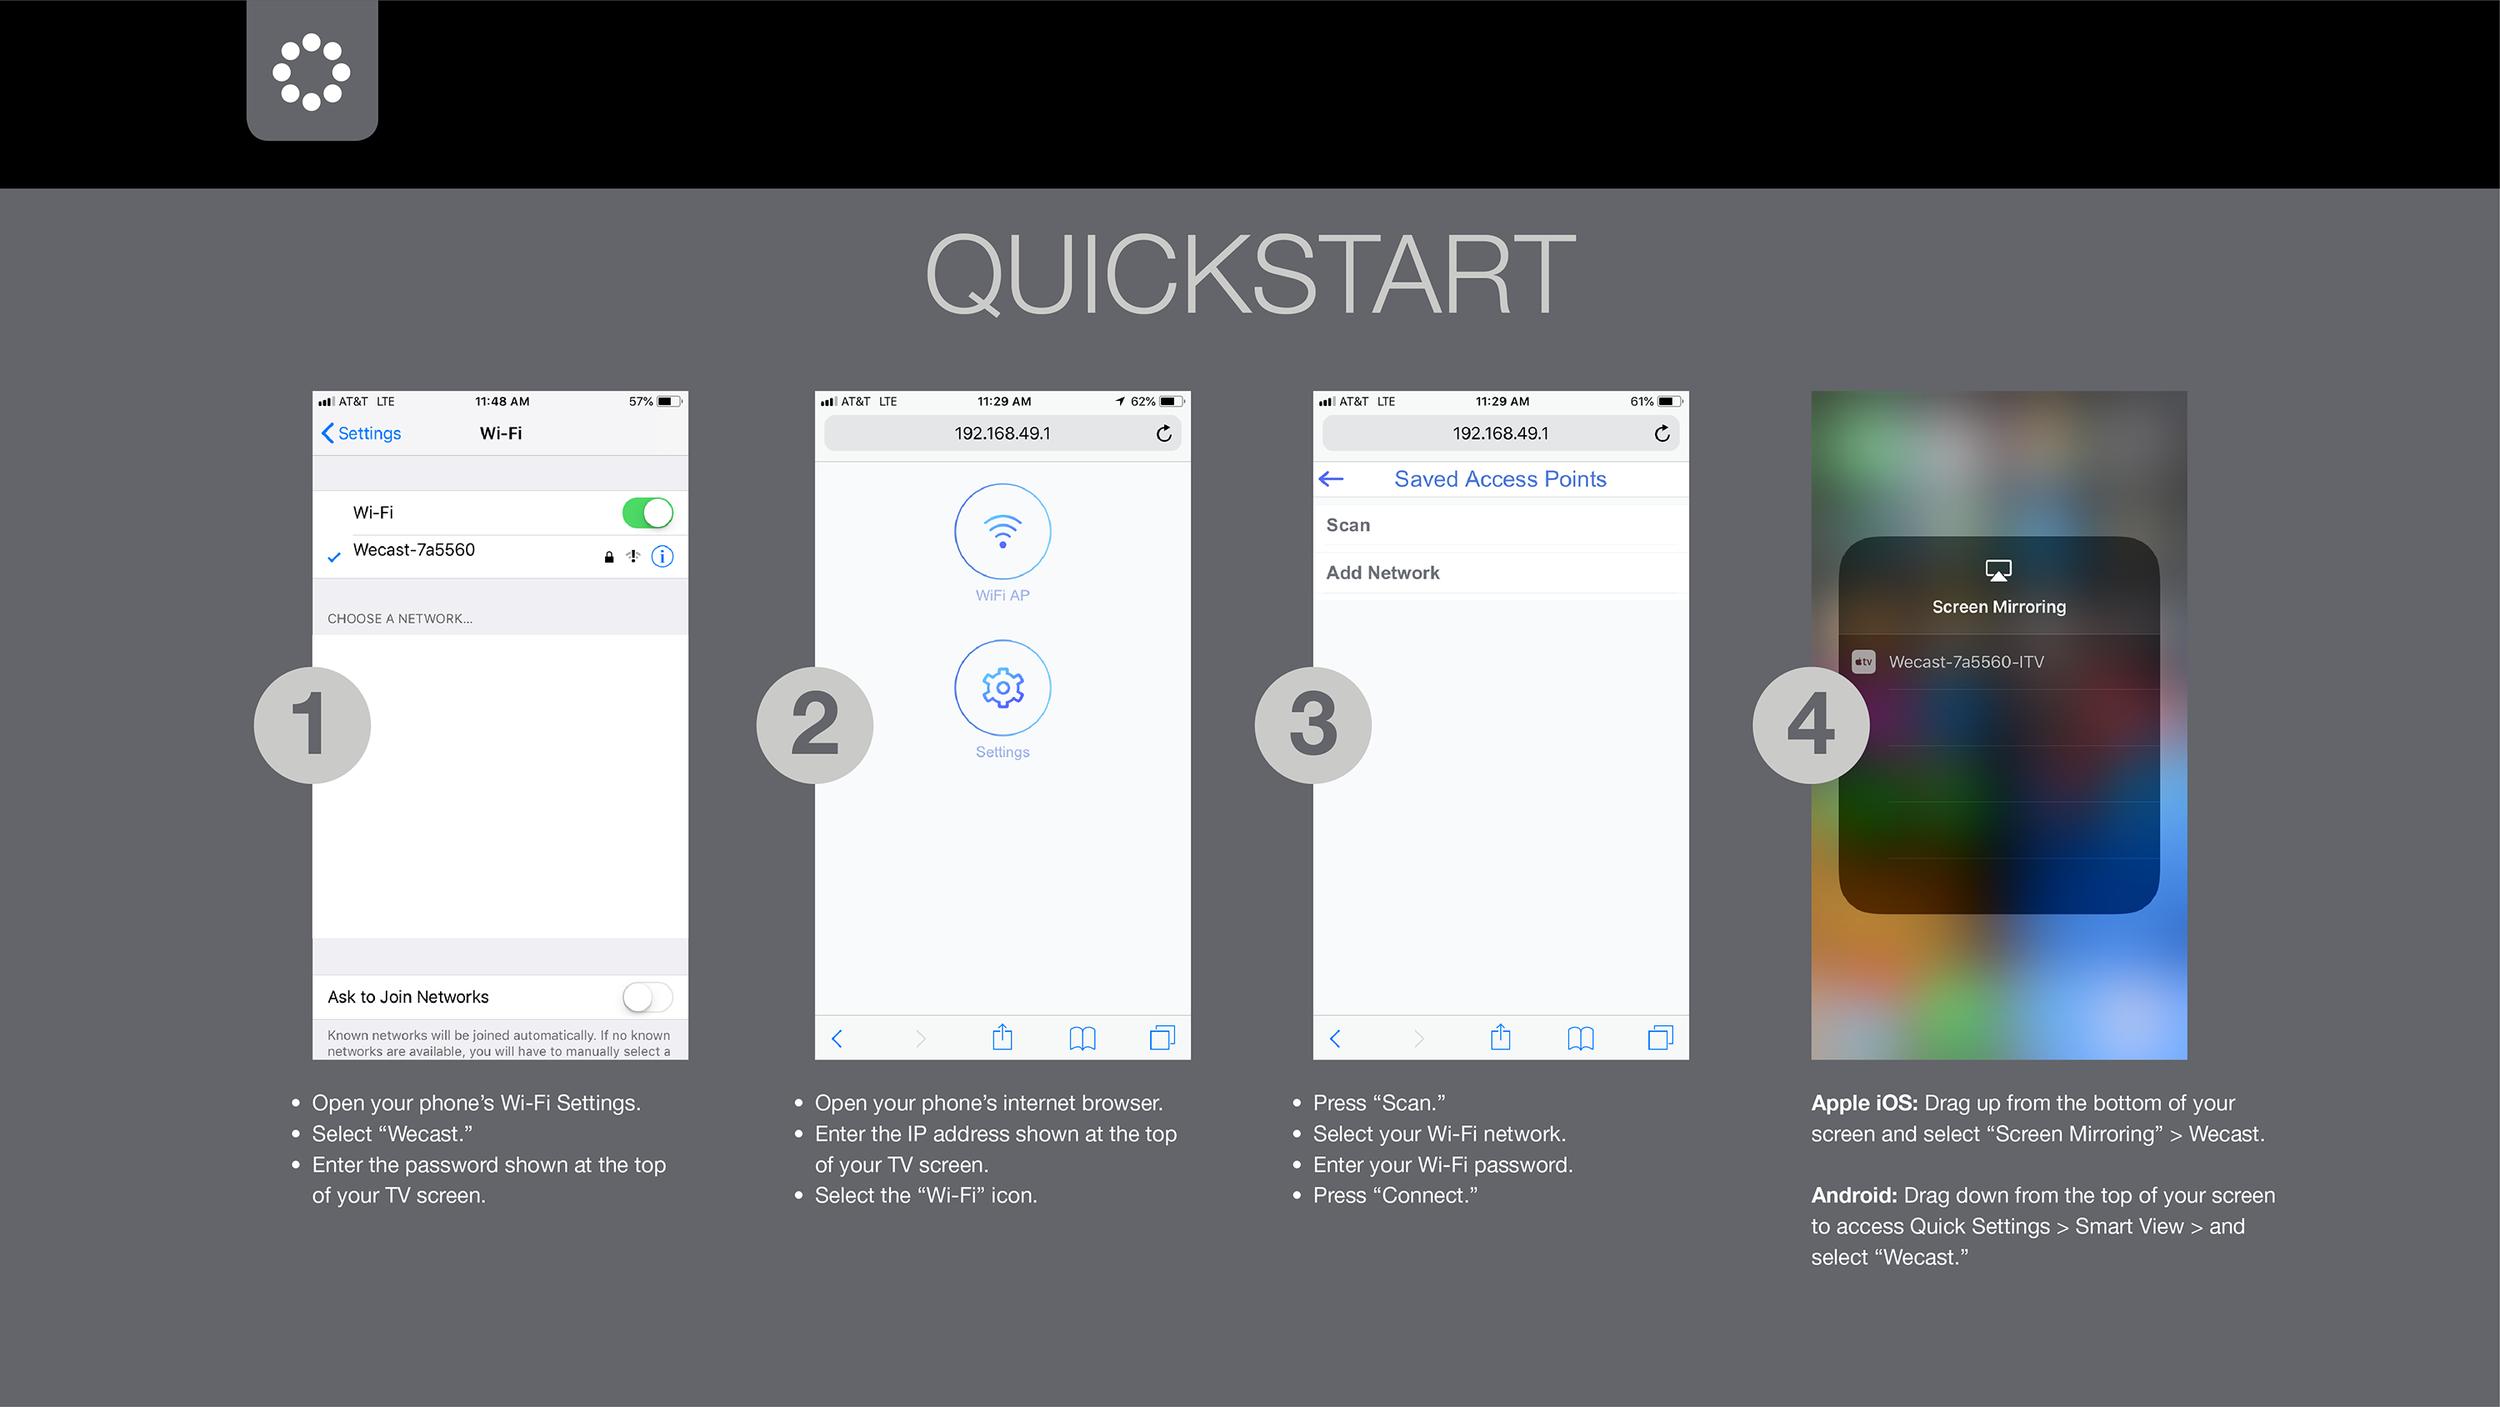 MWD38B Startup Quickstart Screen